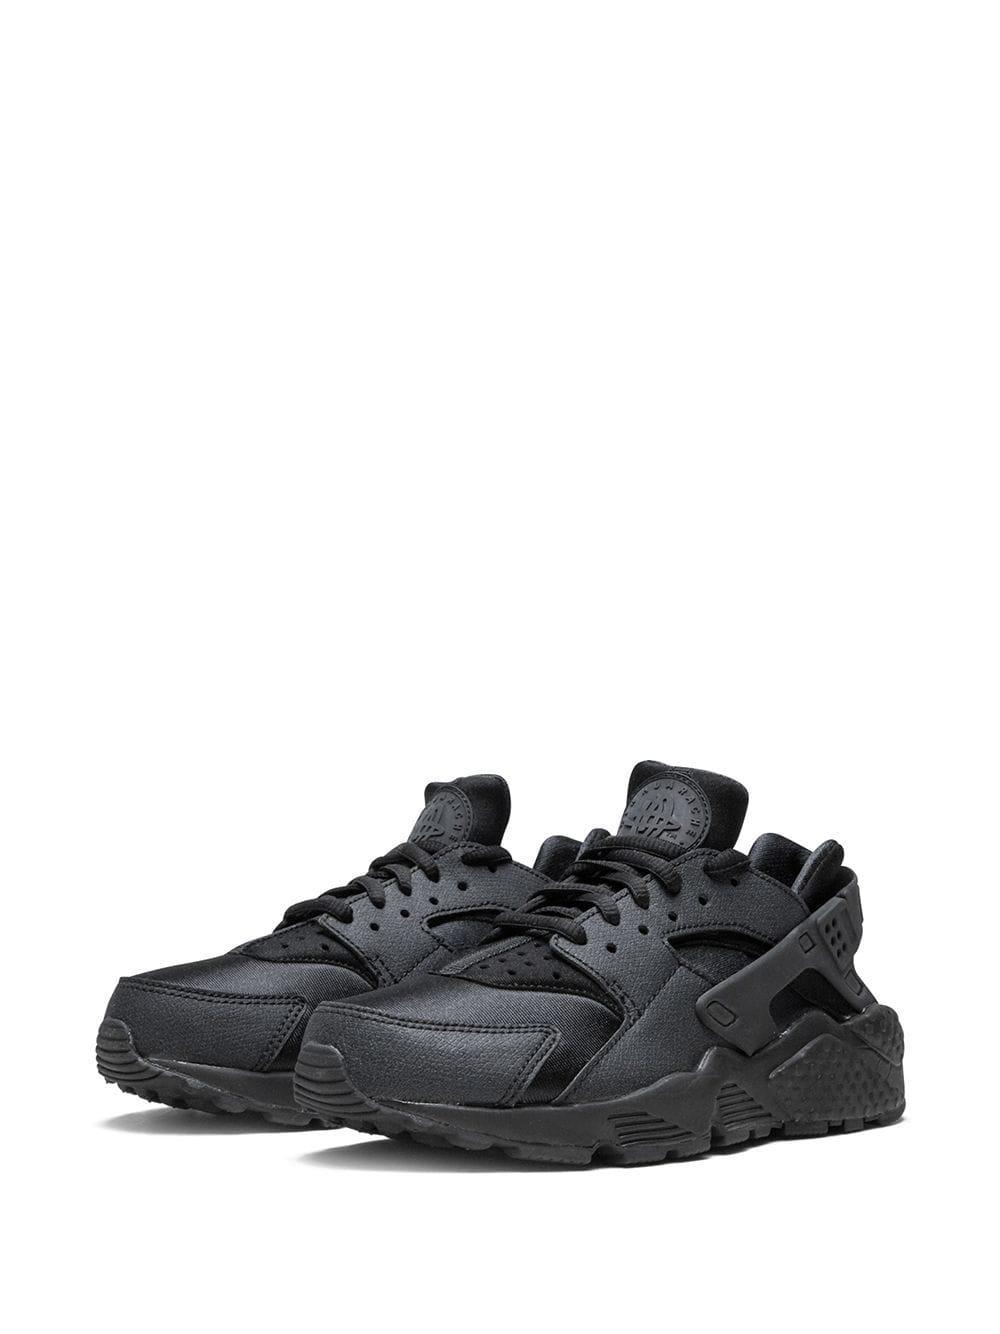 Baskets Air Huarache Run Cuir Nike en coloris Noir 63lA